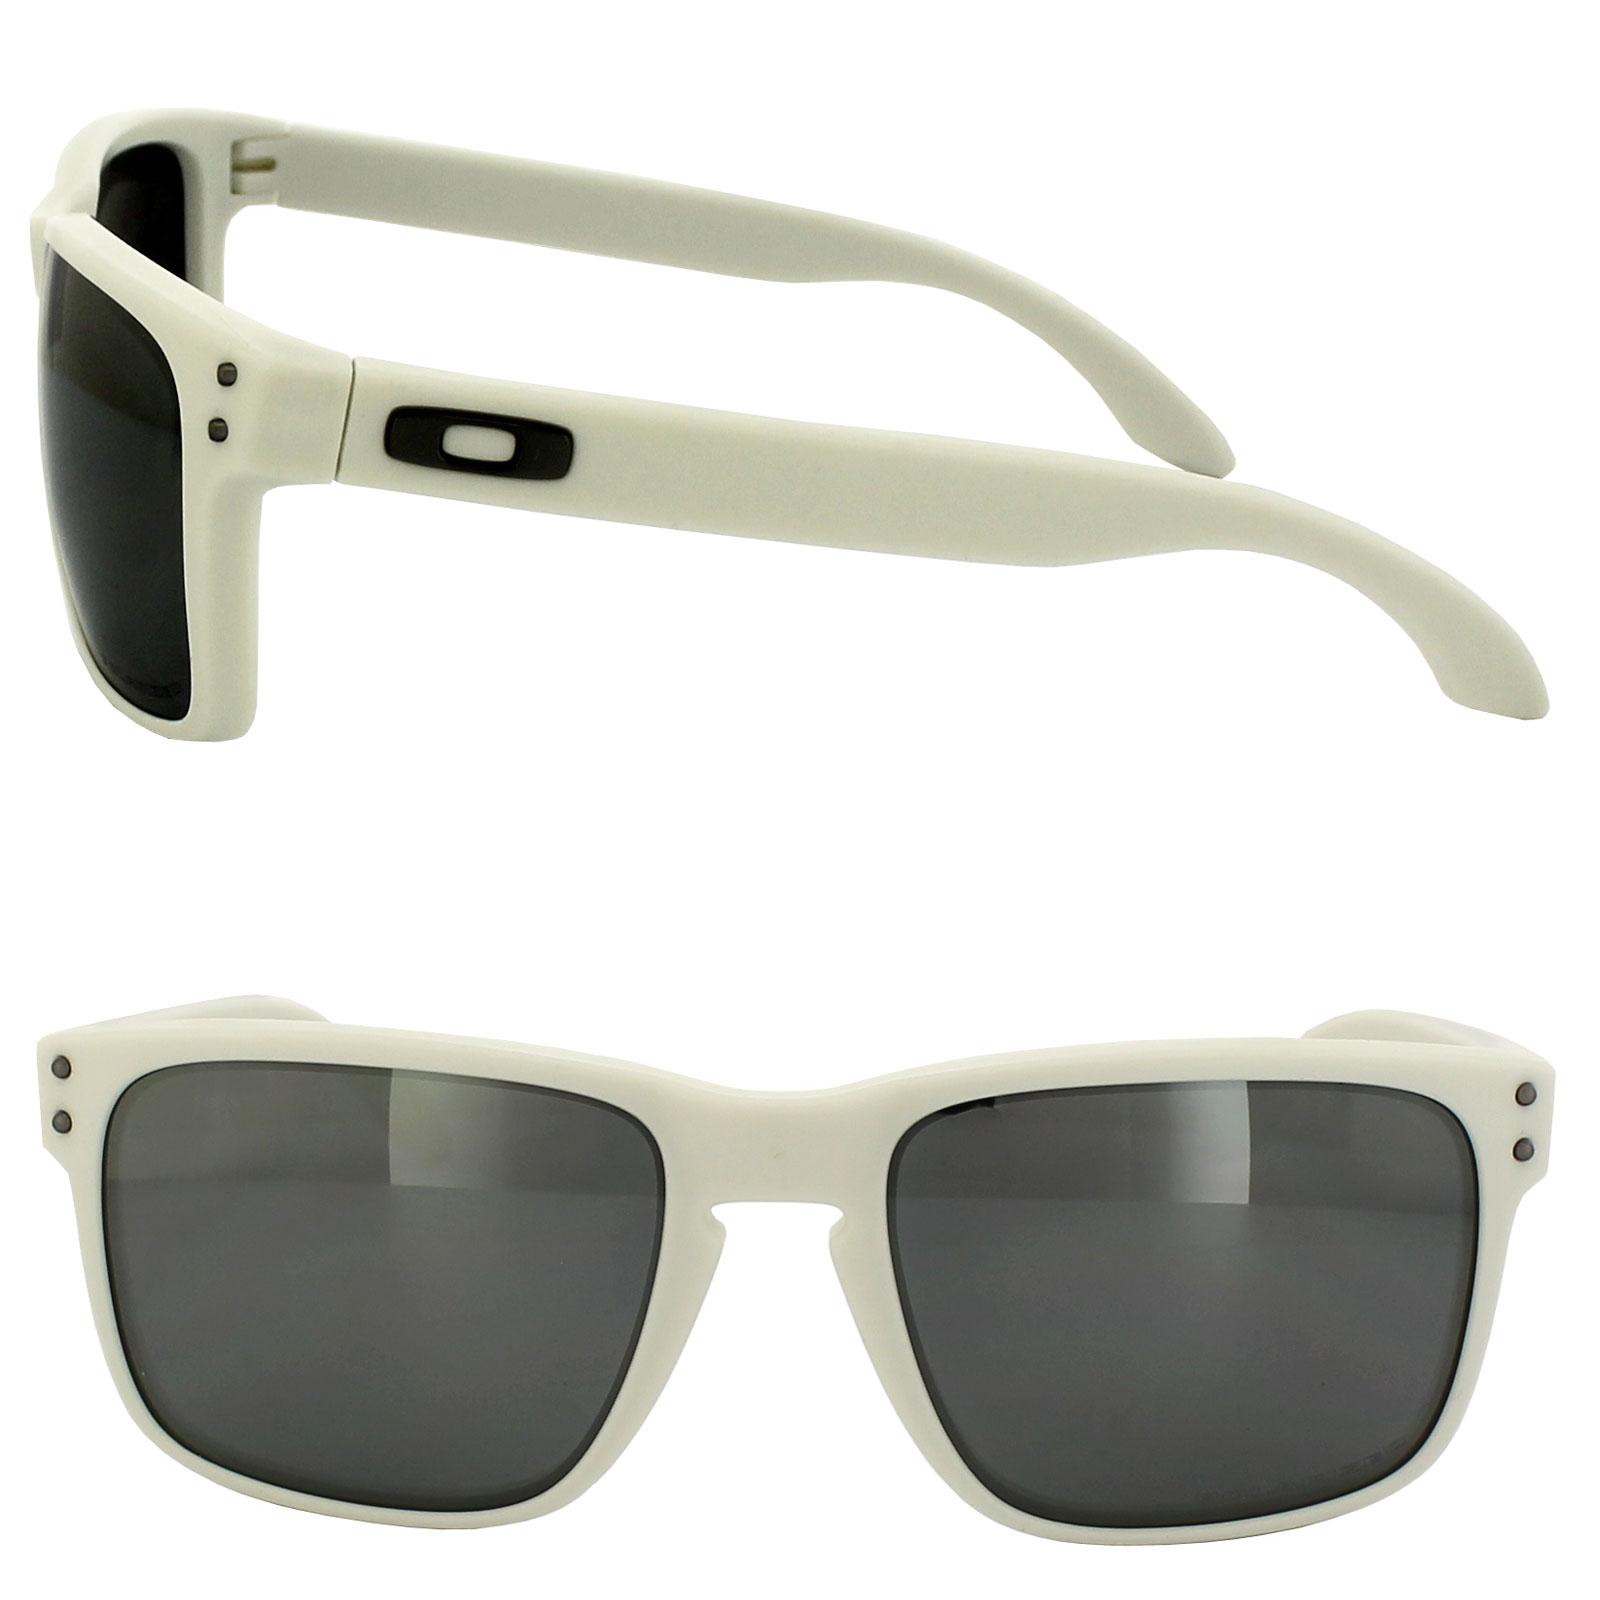 ... Oakley Sunglasses Holbrook 9102-71 Matt Cloud White Black Iridium  Polarized Thumbnail 2 ...